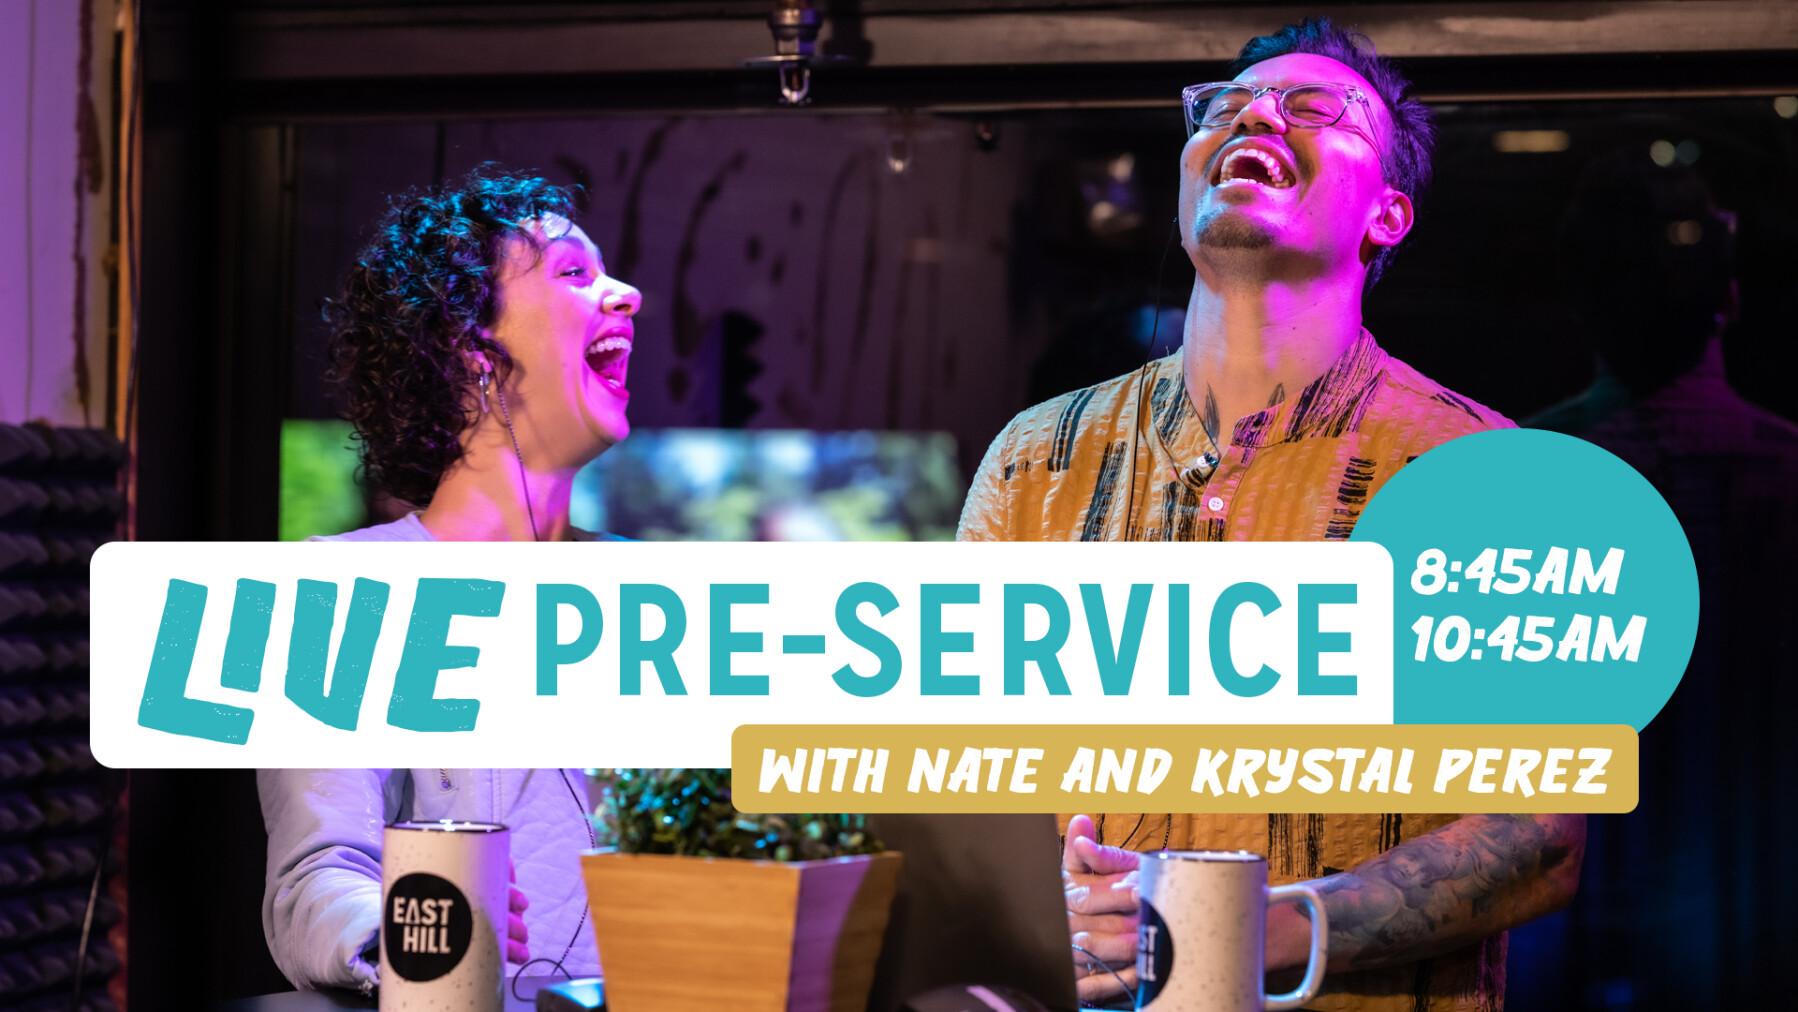 Live Pre-Service with Nate & Krystal